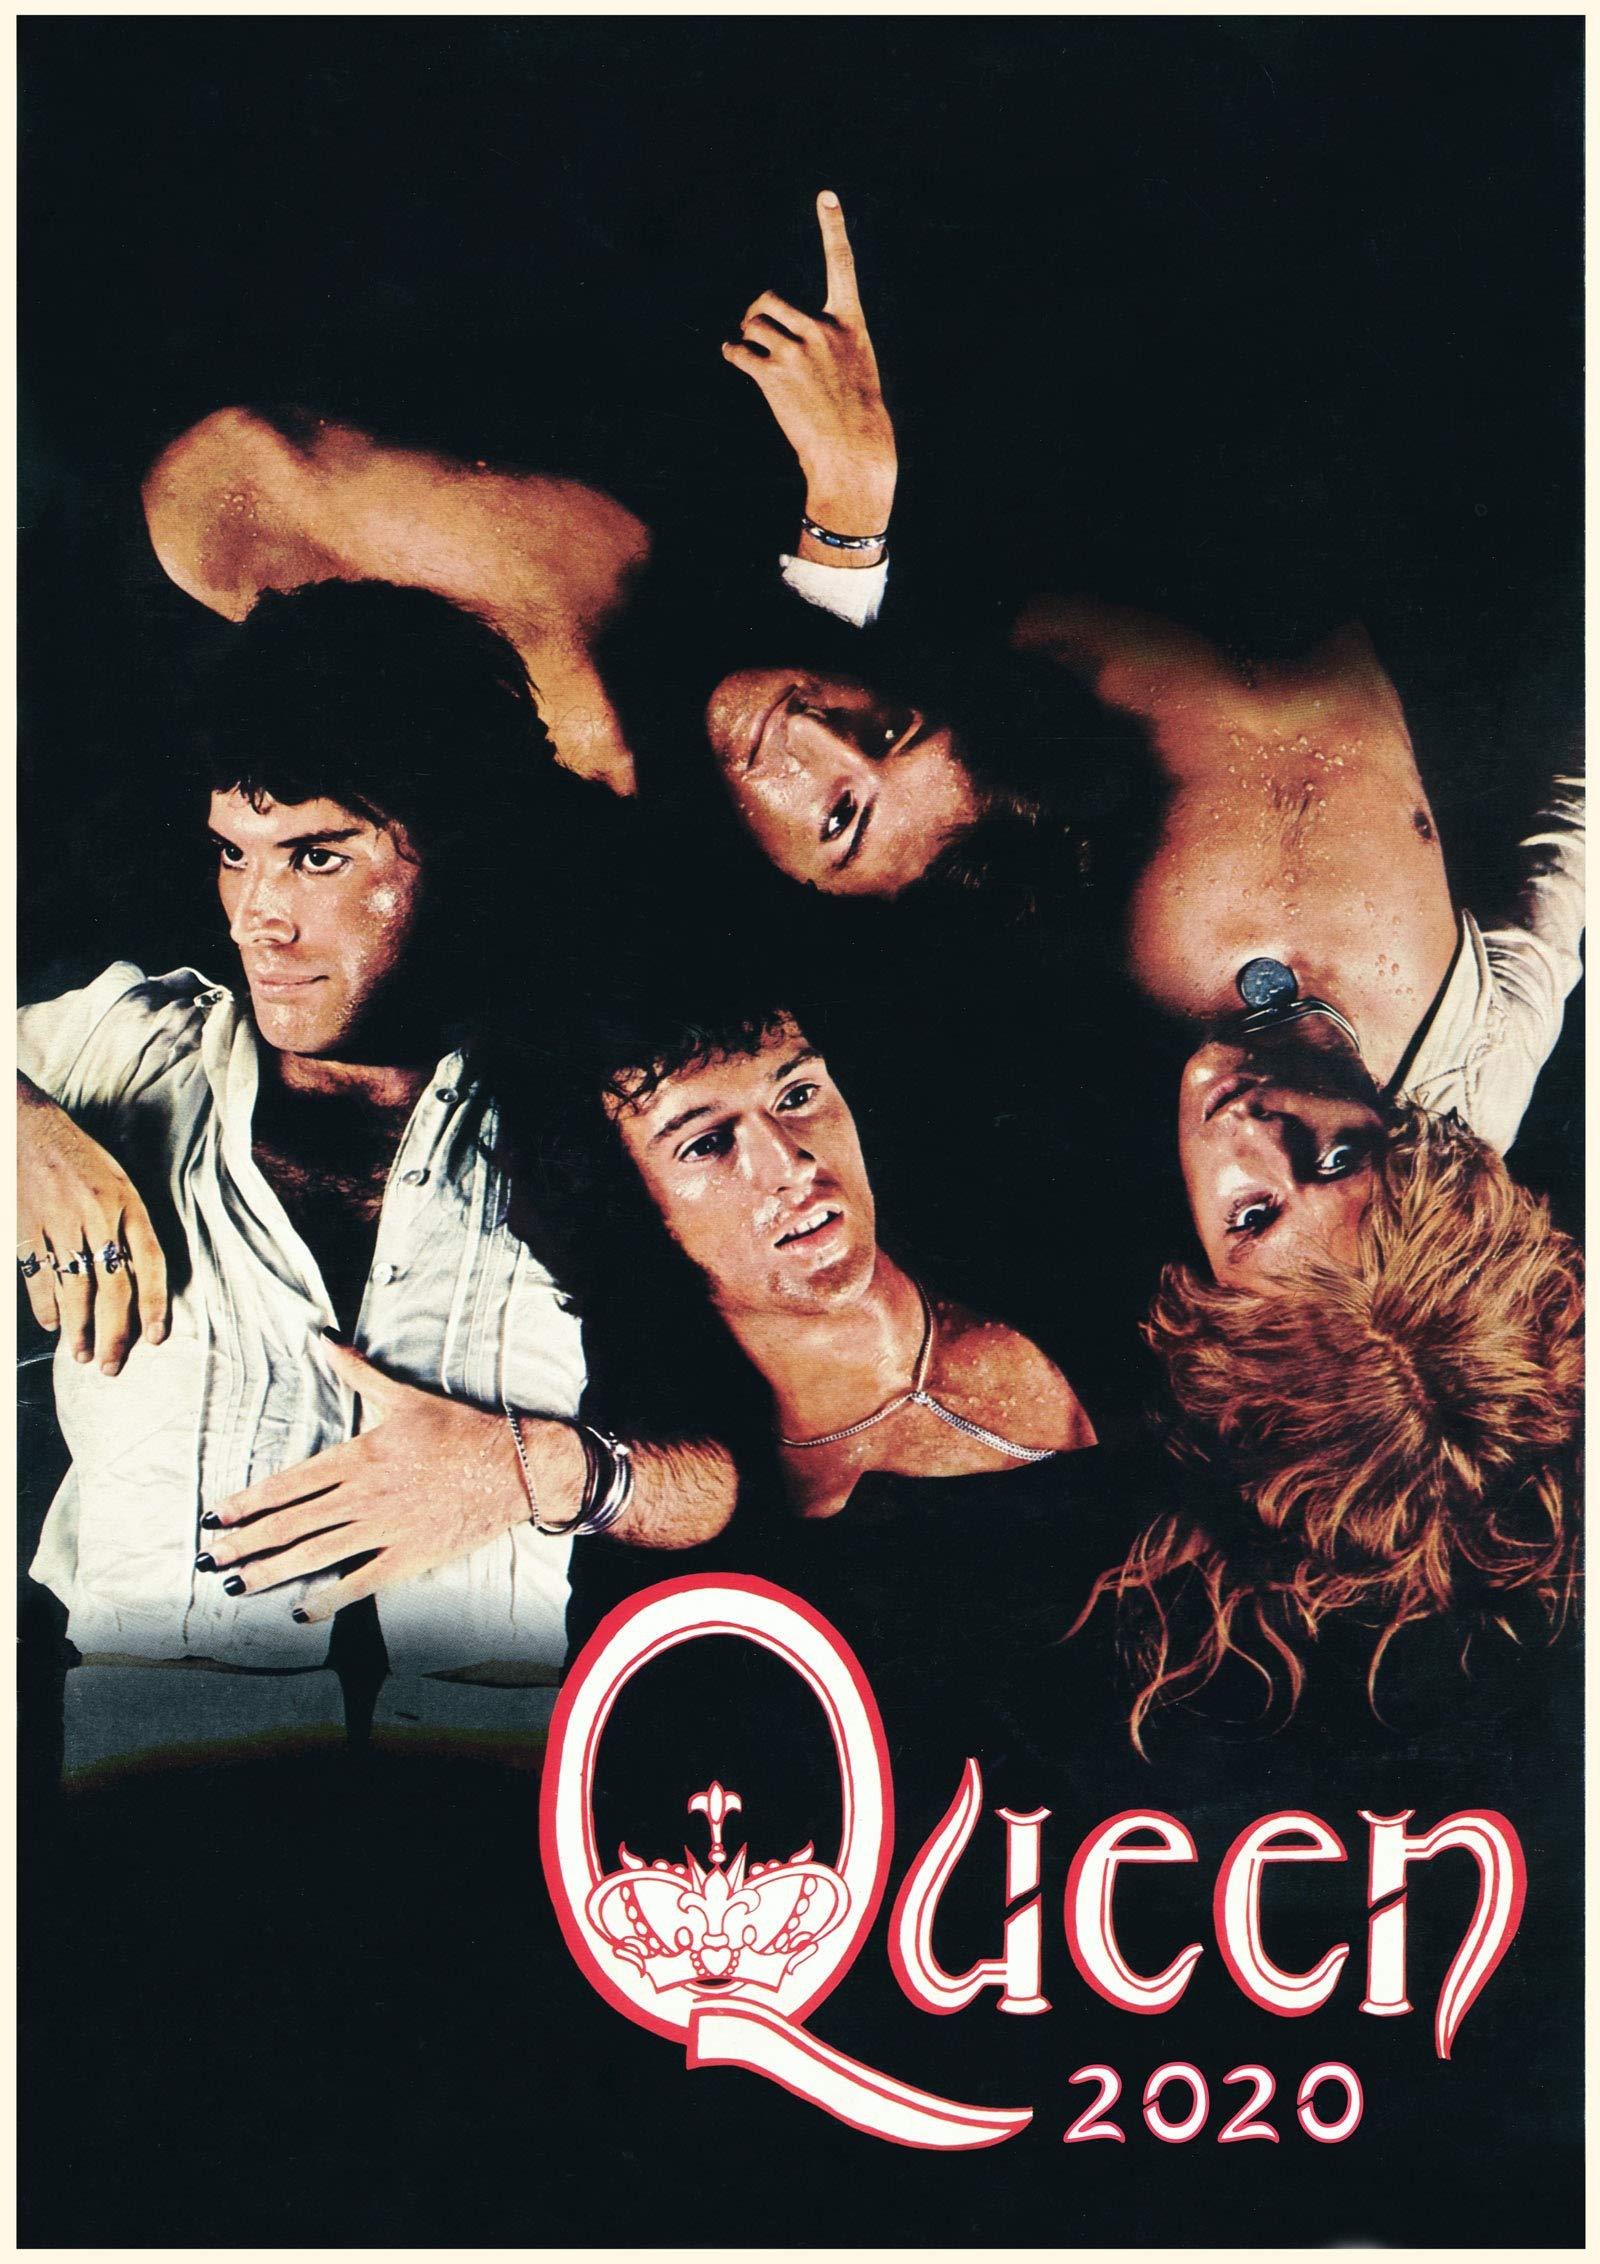 Queen 2 Freddie Mercury Photo Rock Band Legend Picture Vintage Music Poster